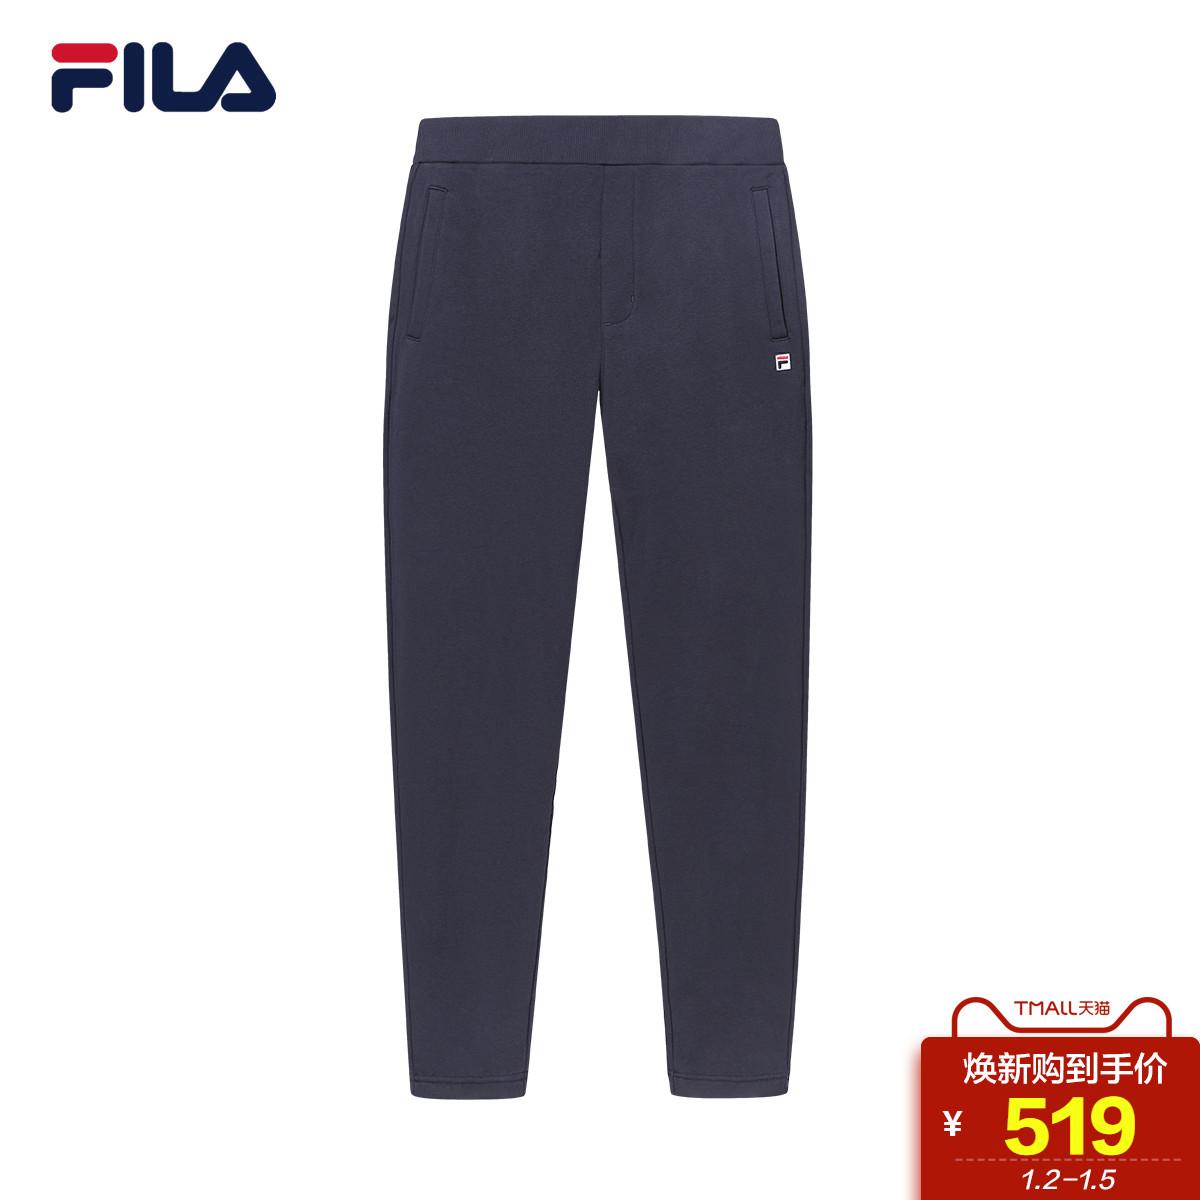 FILA斐乐长裤男2018冬季新款潮流时尚休闲运动裤针织舒适运动裤男